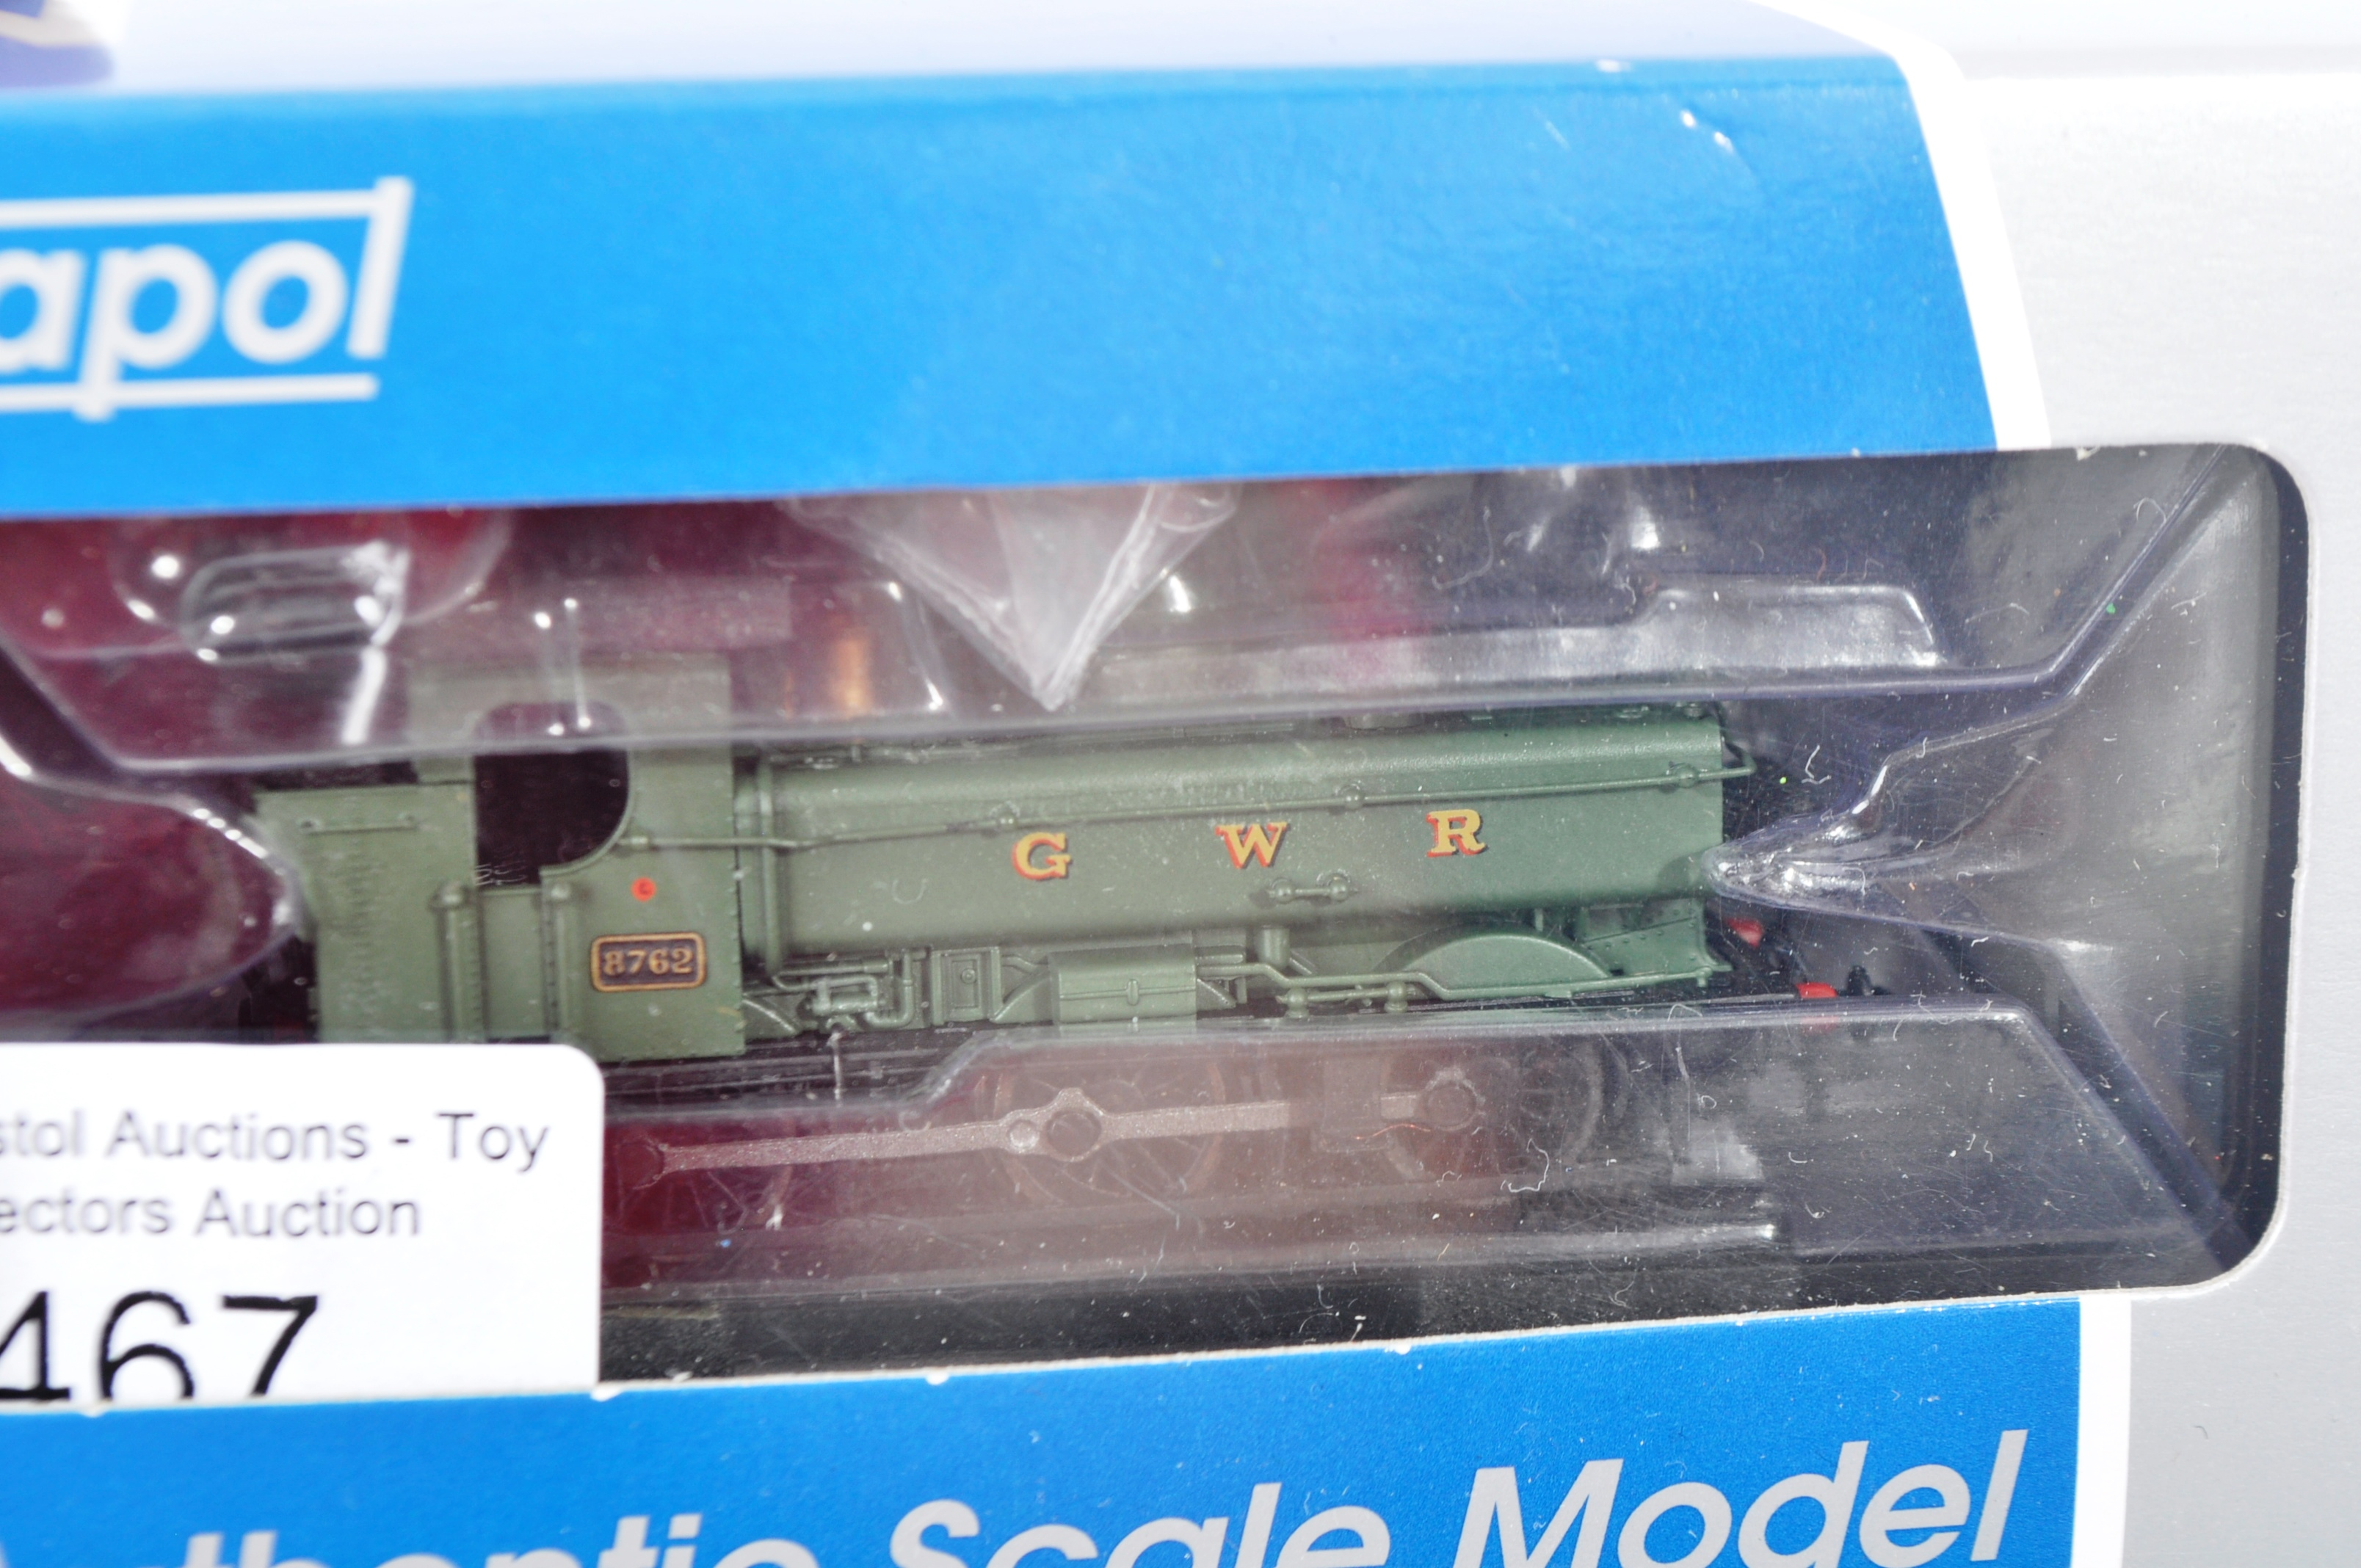 ORIGINAL DAPOL N GAUGE MODEL RAILWAY TRAINSET LOCOMOTIVE - Image 2 of 3